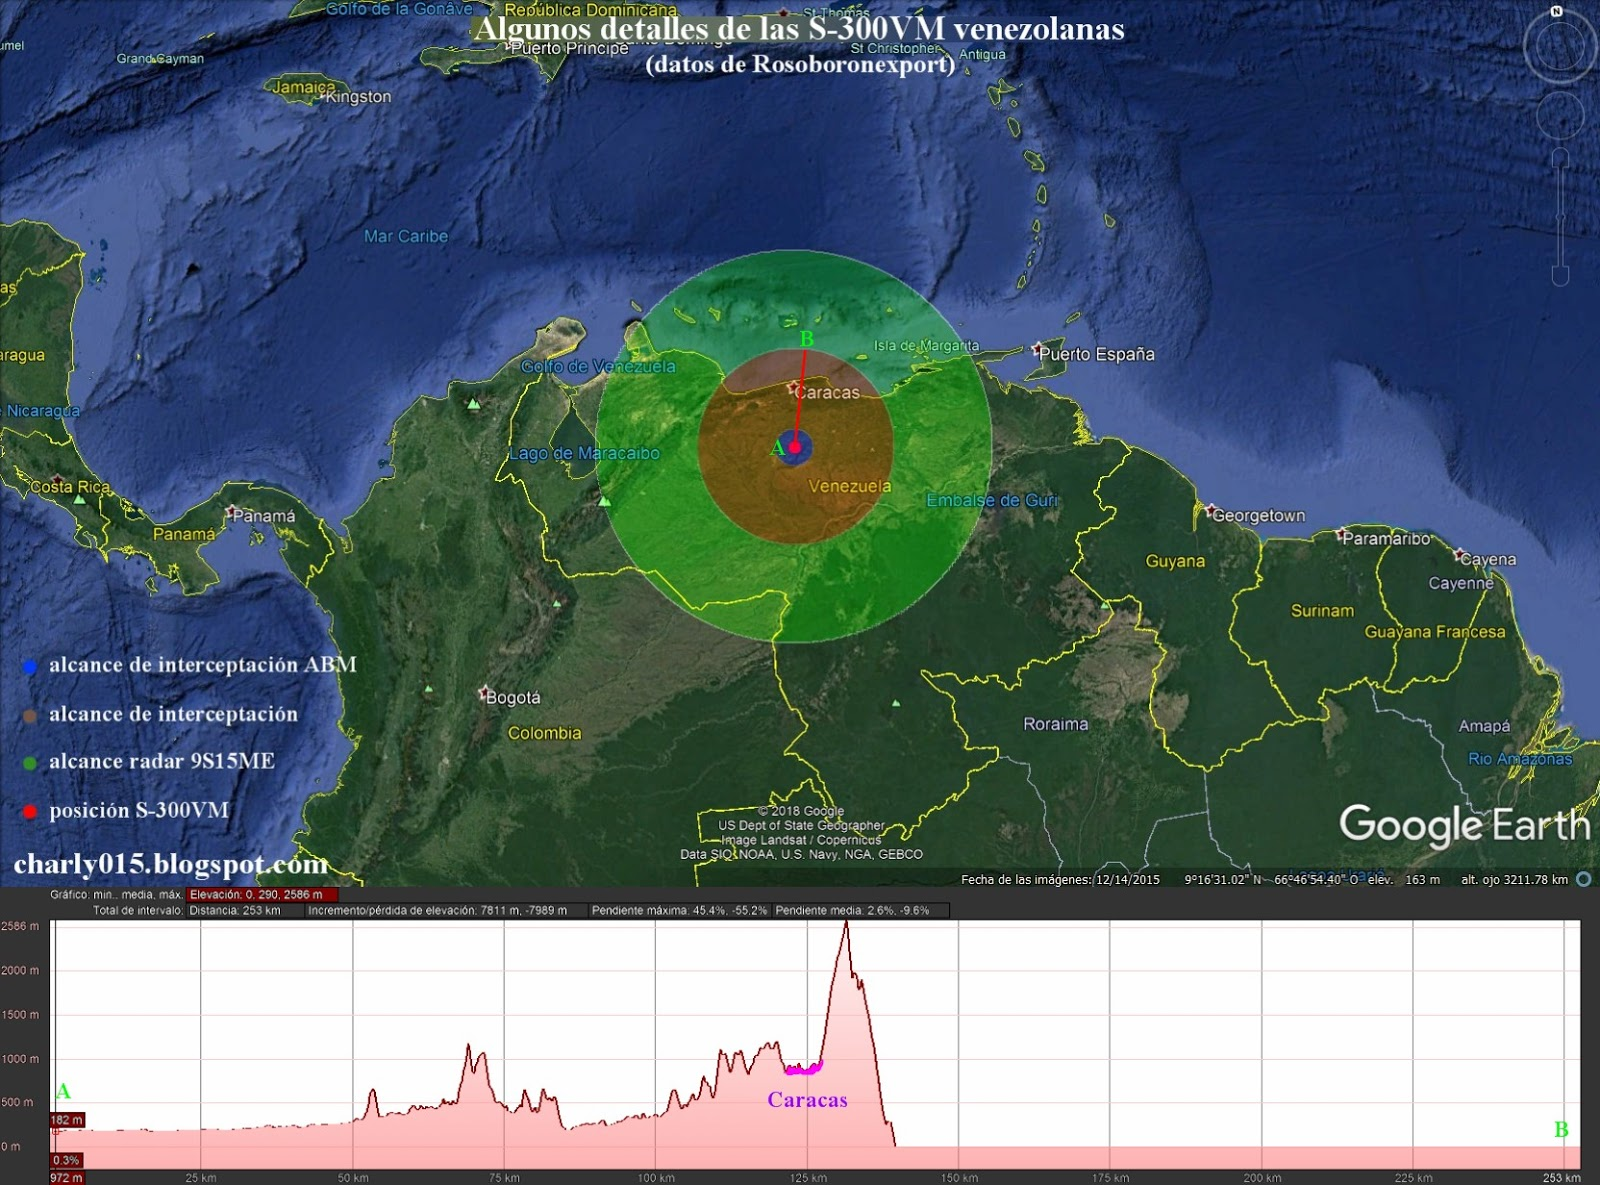 Sistema S-300VM Antey-2500 - Página 2 Venezuela%2Bs-300vm%2Bcobertura%2Borograf%25C3%25ADa%2Bcaracas%2Bsin%2Bcobertura%2B2